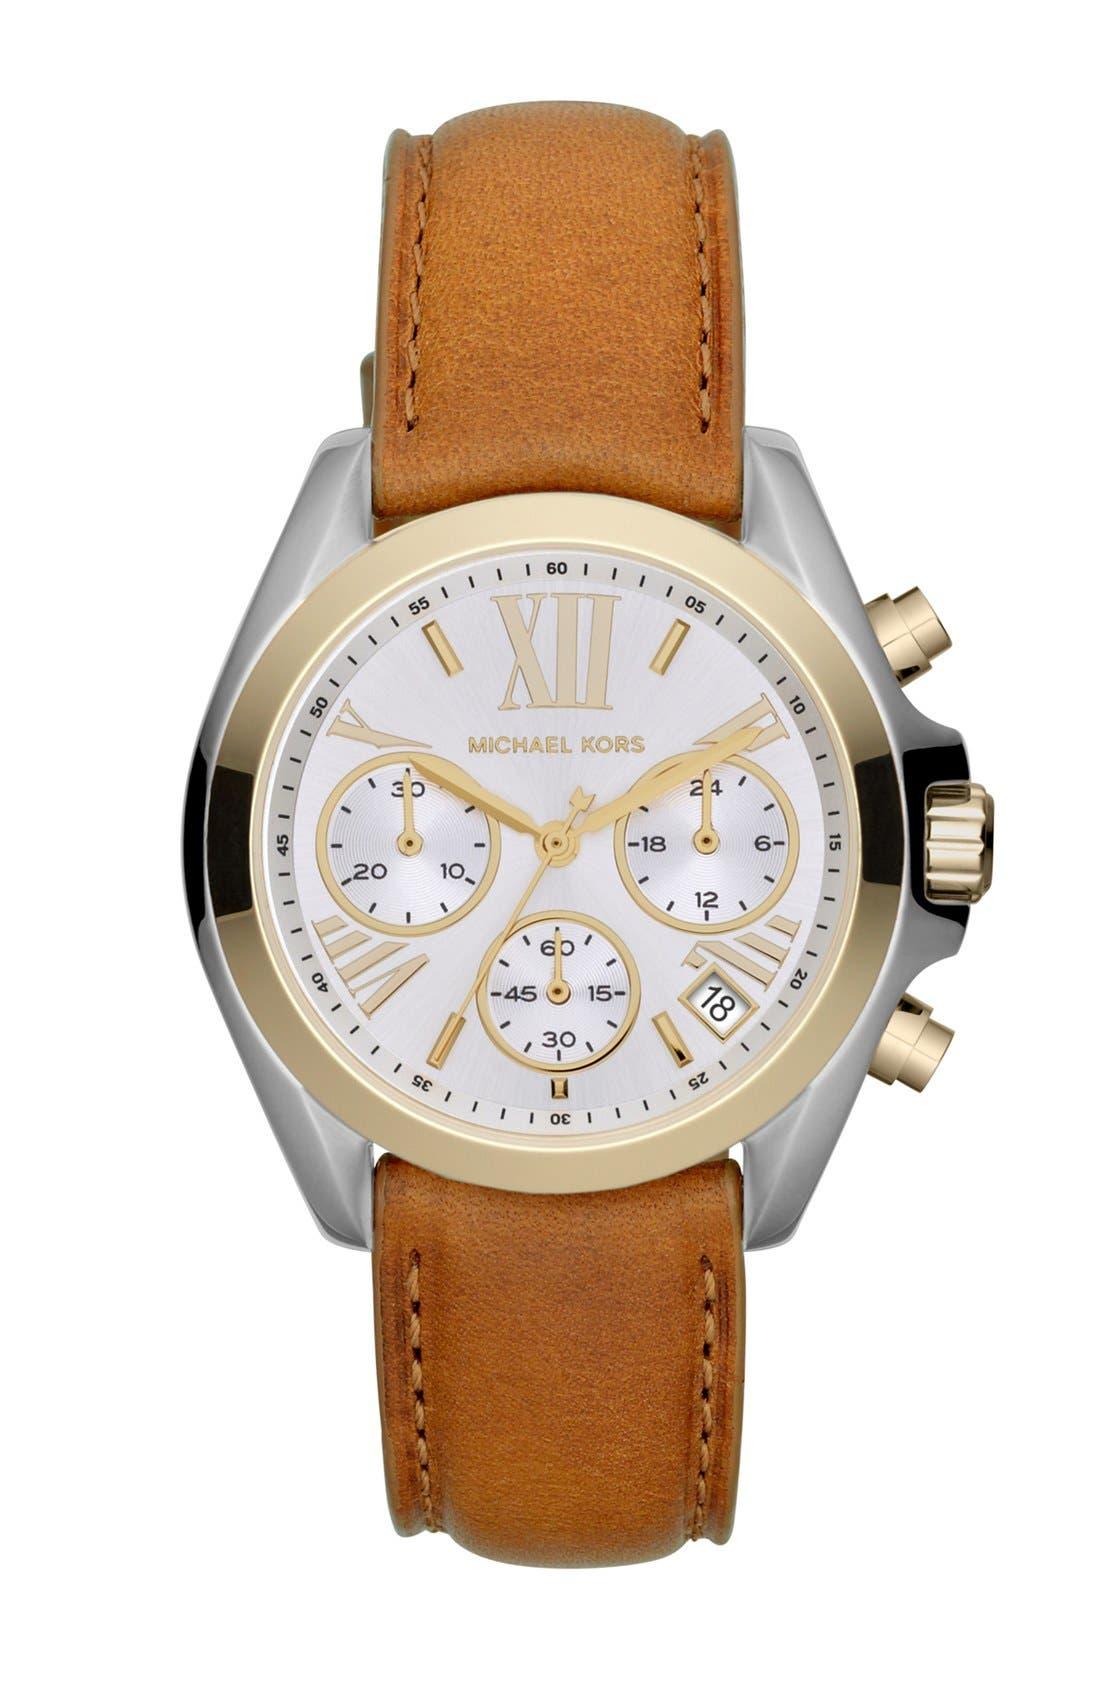 Main Image - Michael Kors 'Bradshaw - Mini' Chronograph Watch, 36mm